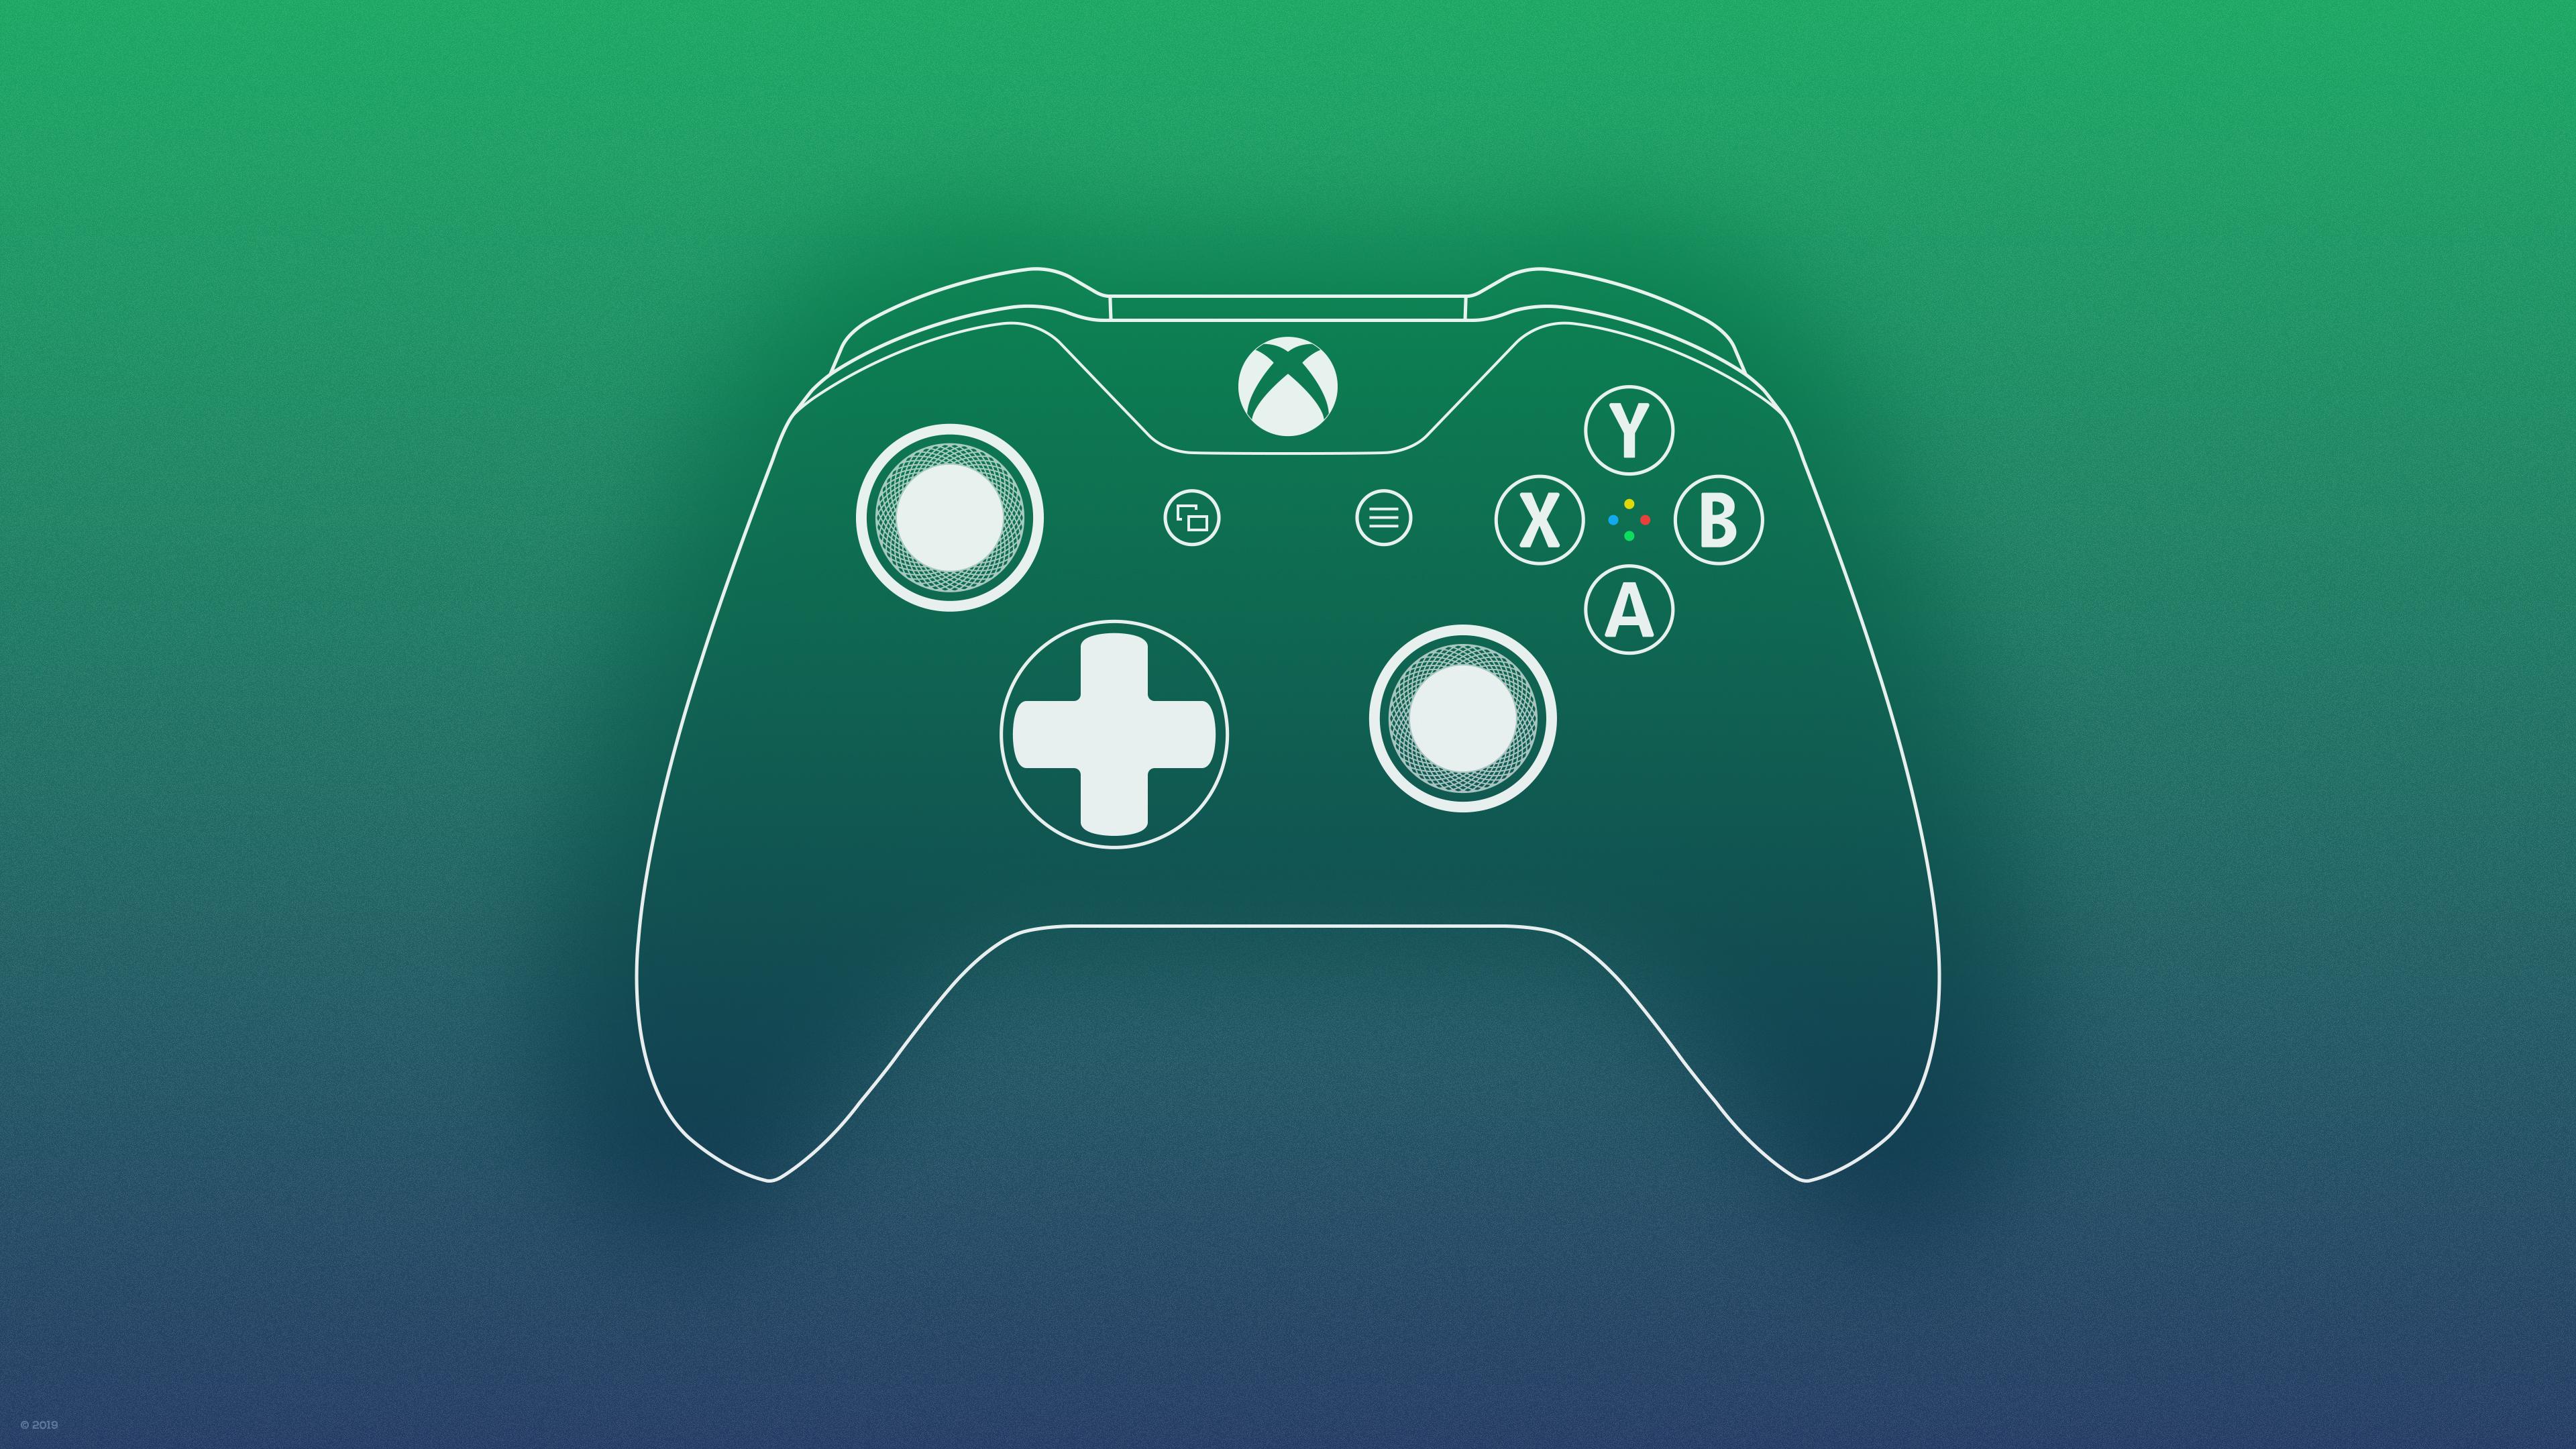 Xbox Controller Wallpaper 2 0 By Ljdesigner On Deviantart